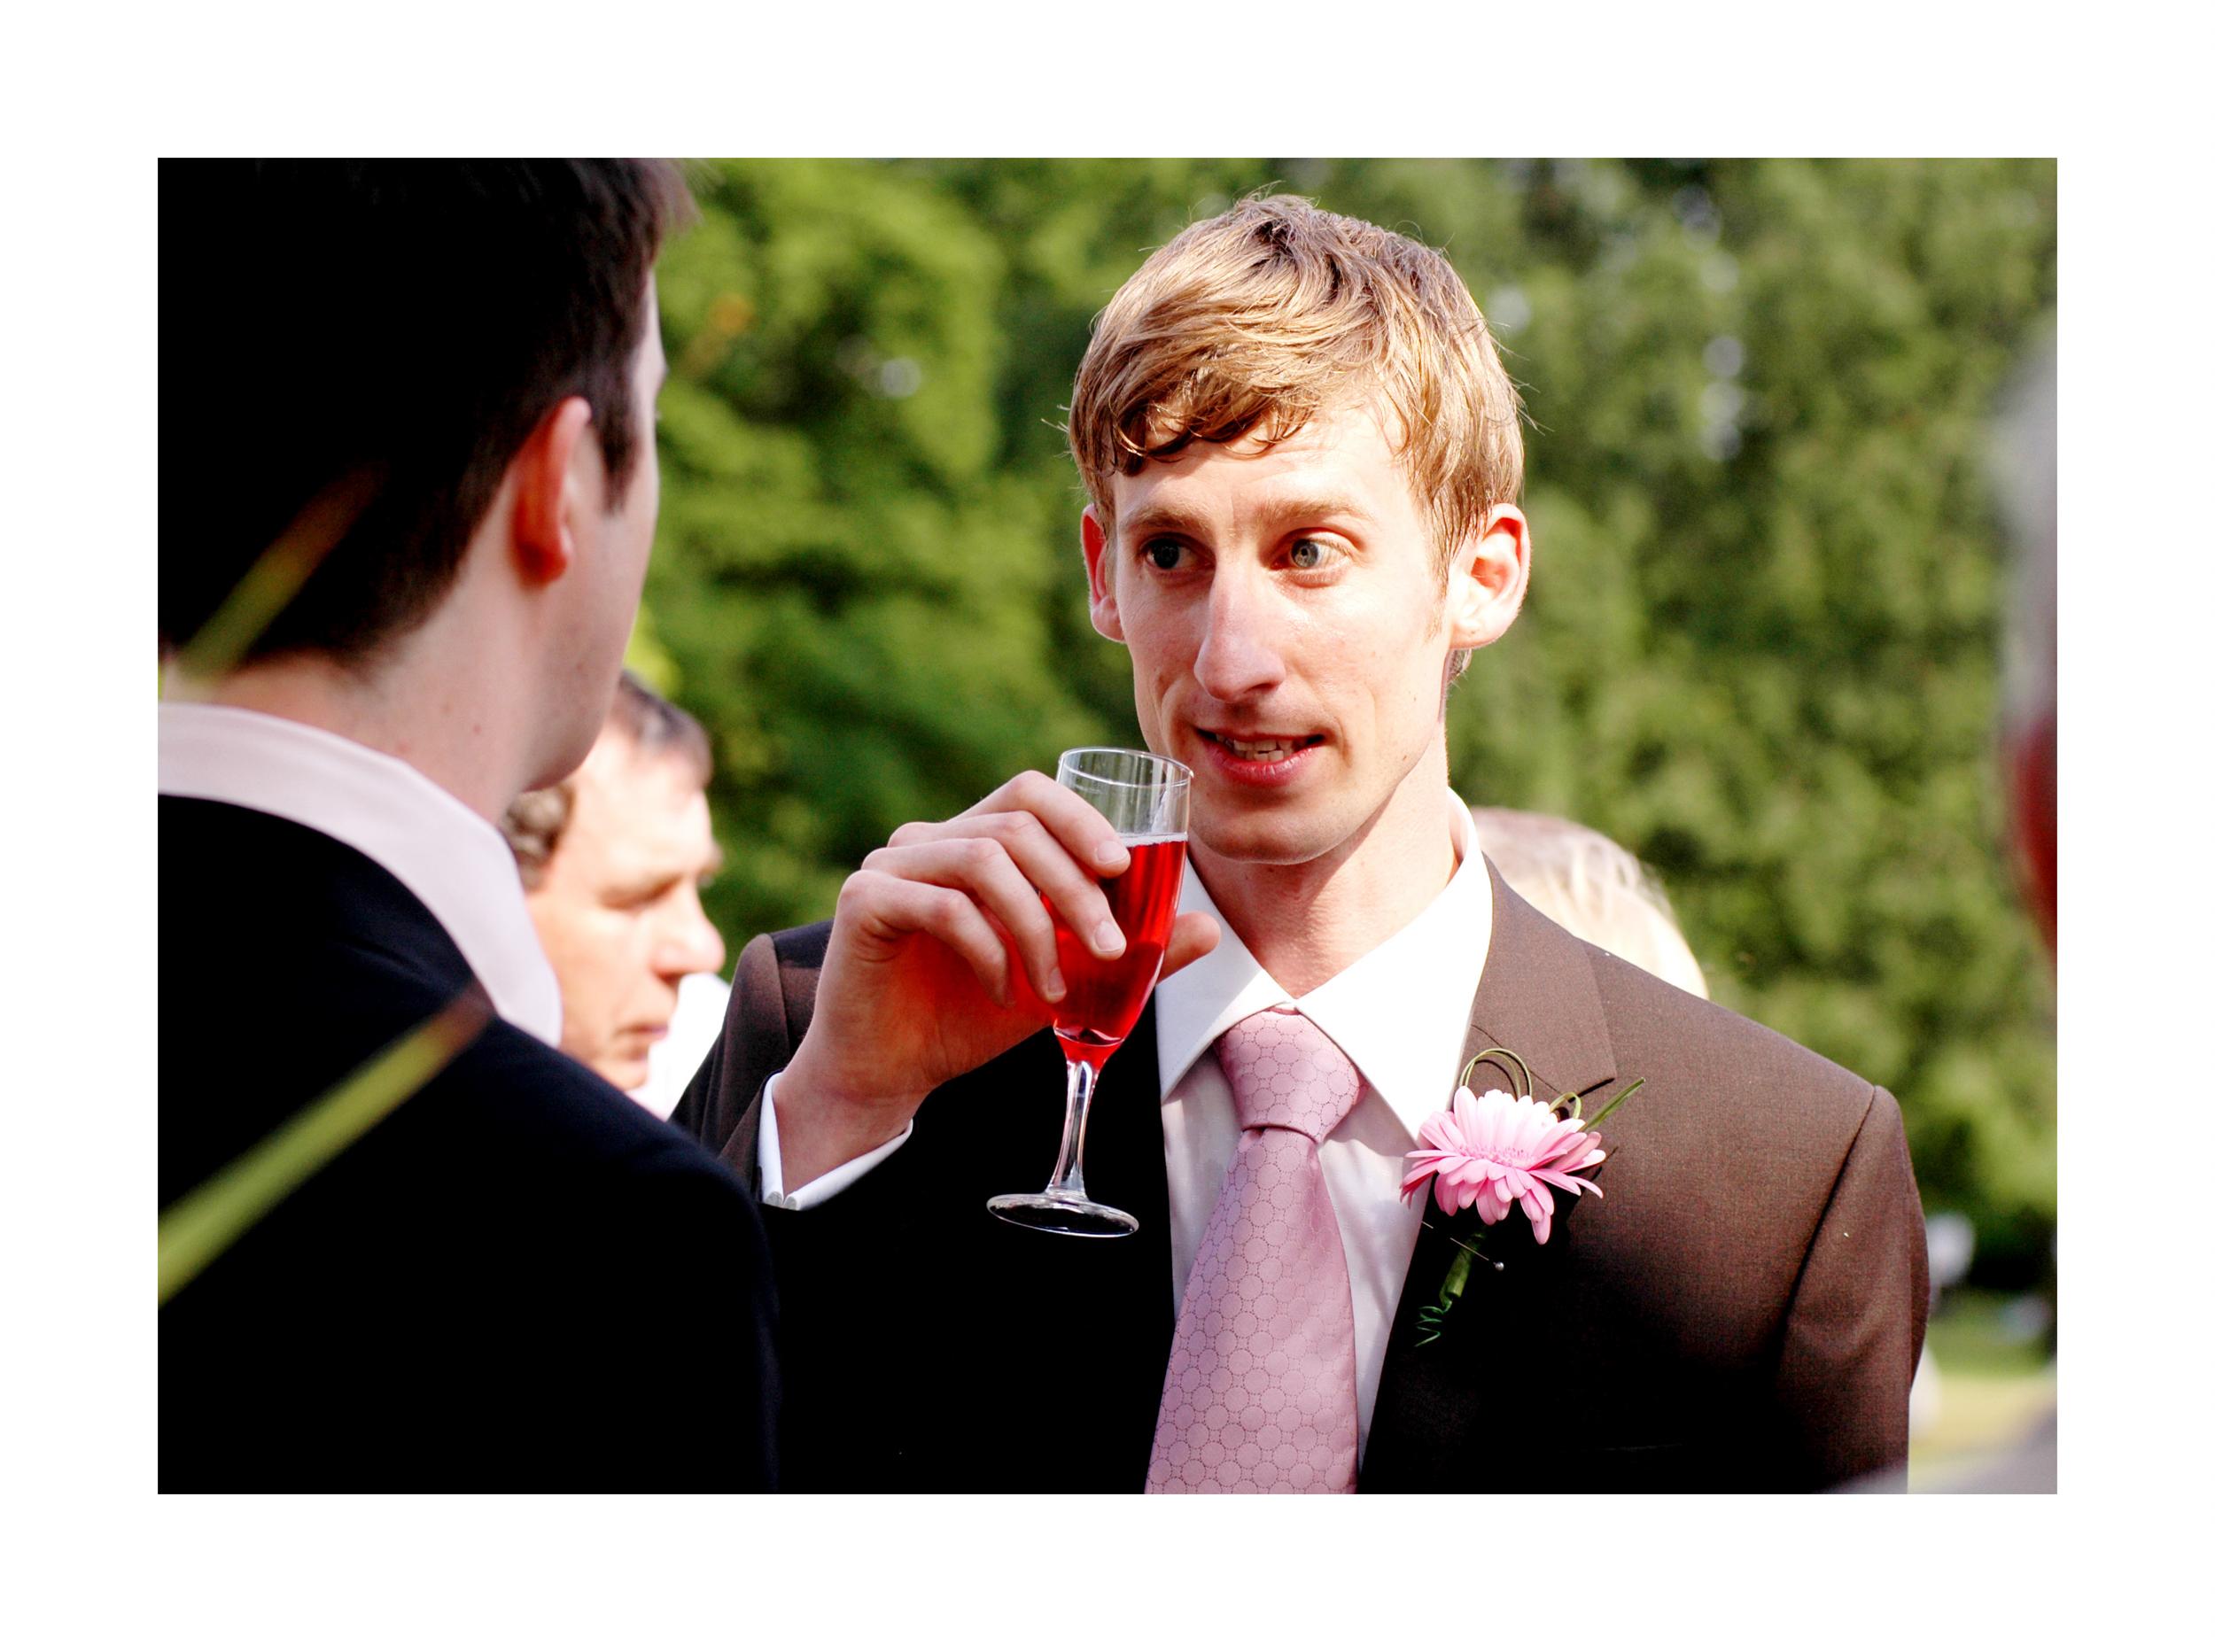 REPORTAGE-WEDDING-PHOTOGRAPHY-SET-UK-29.jpg